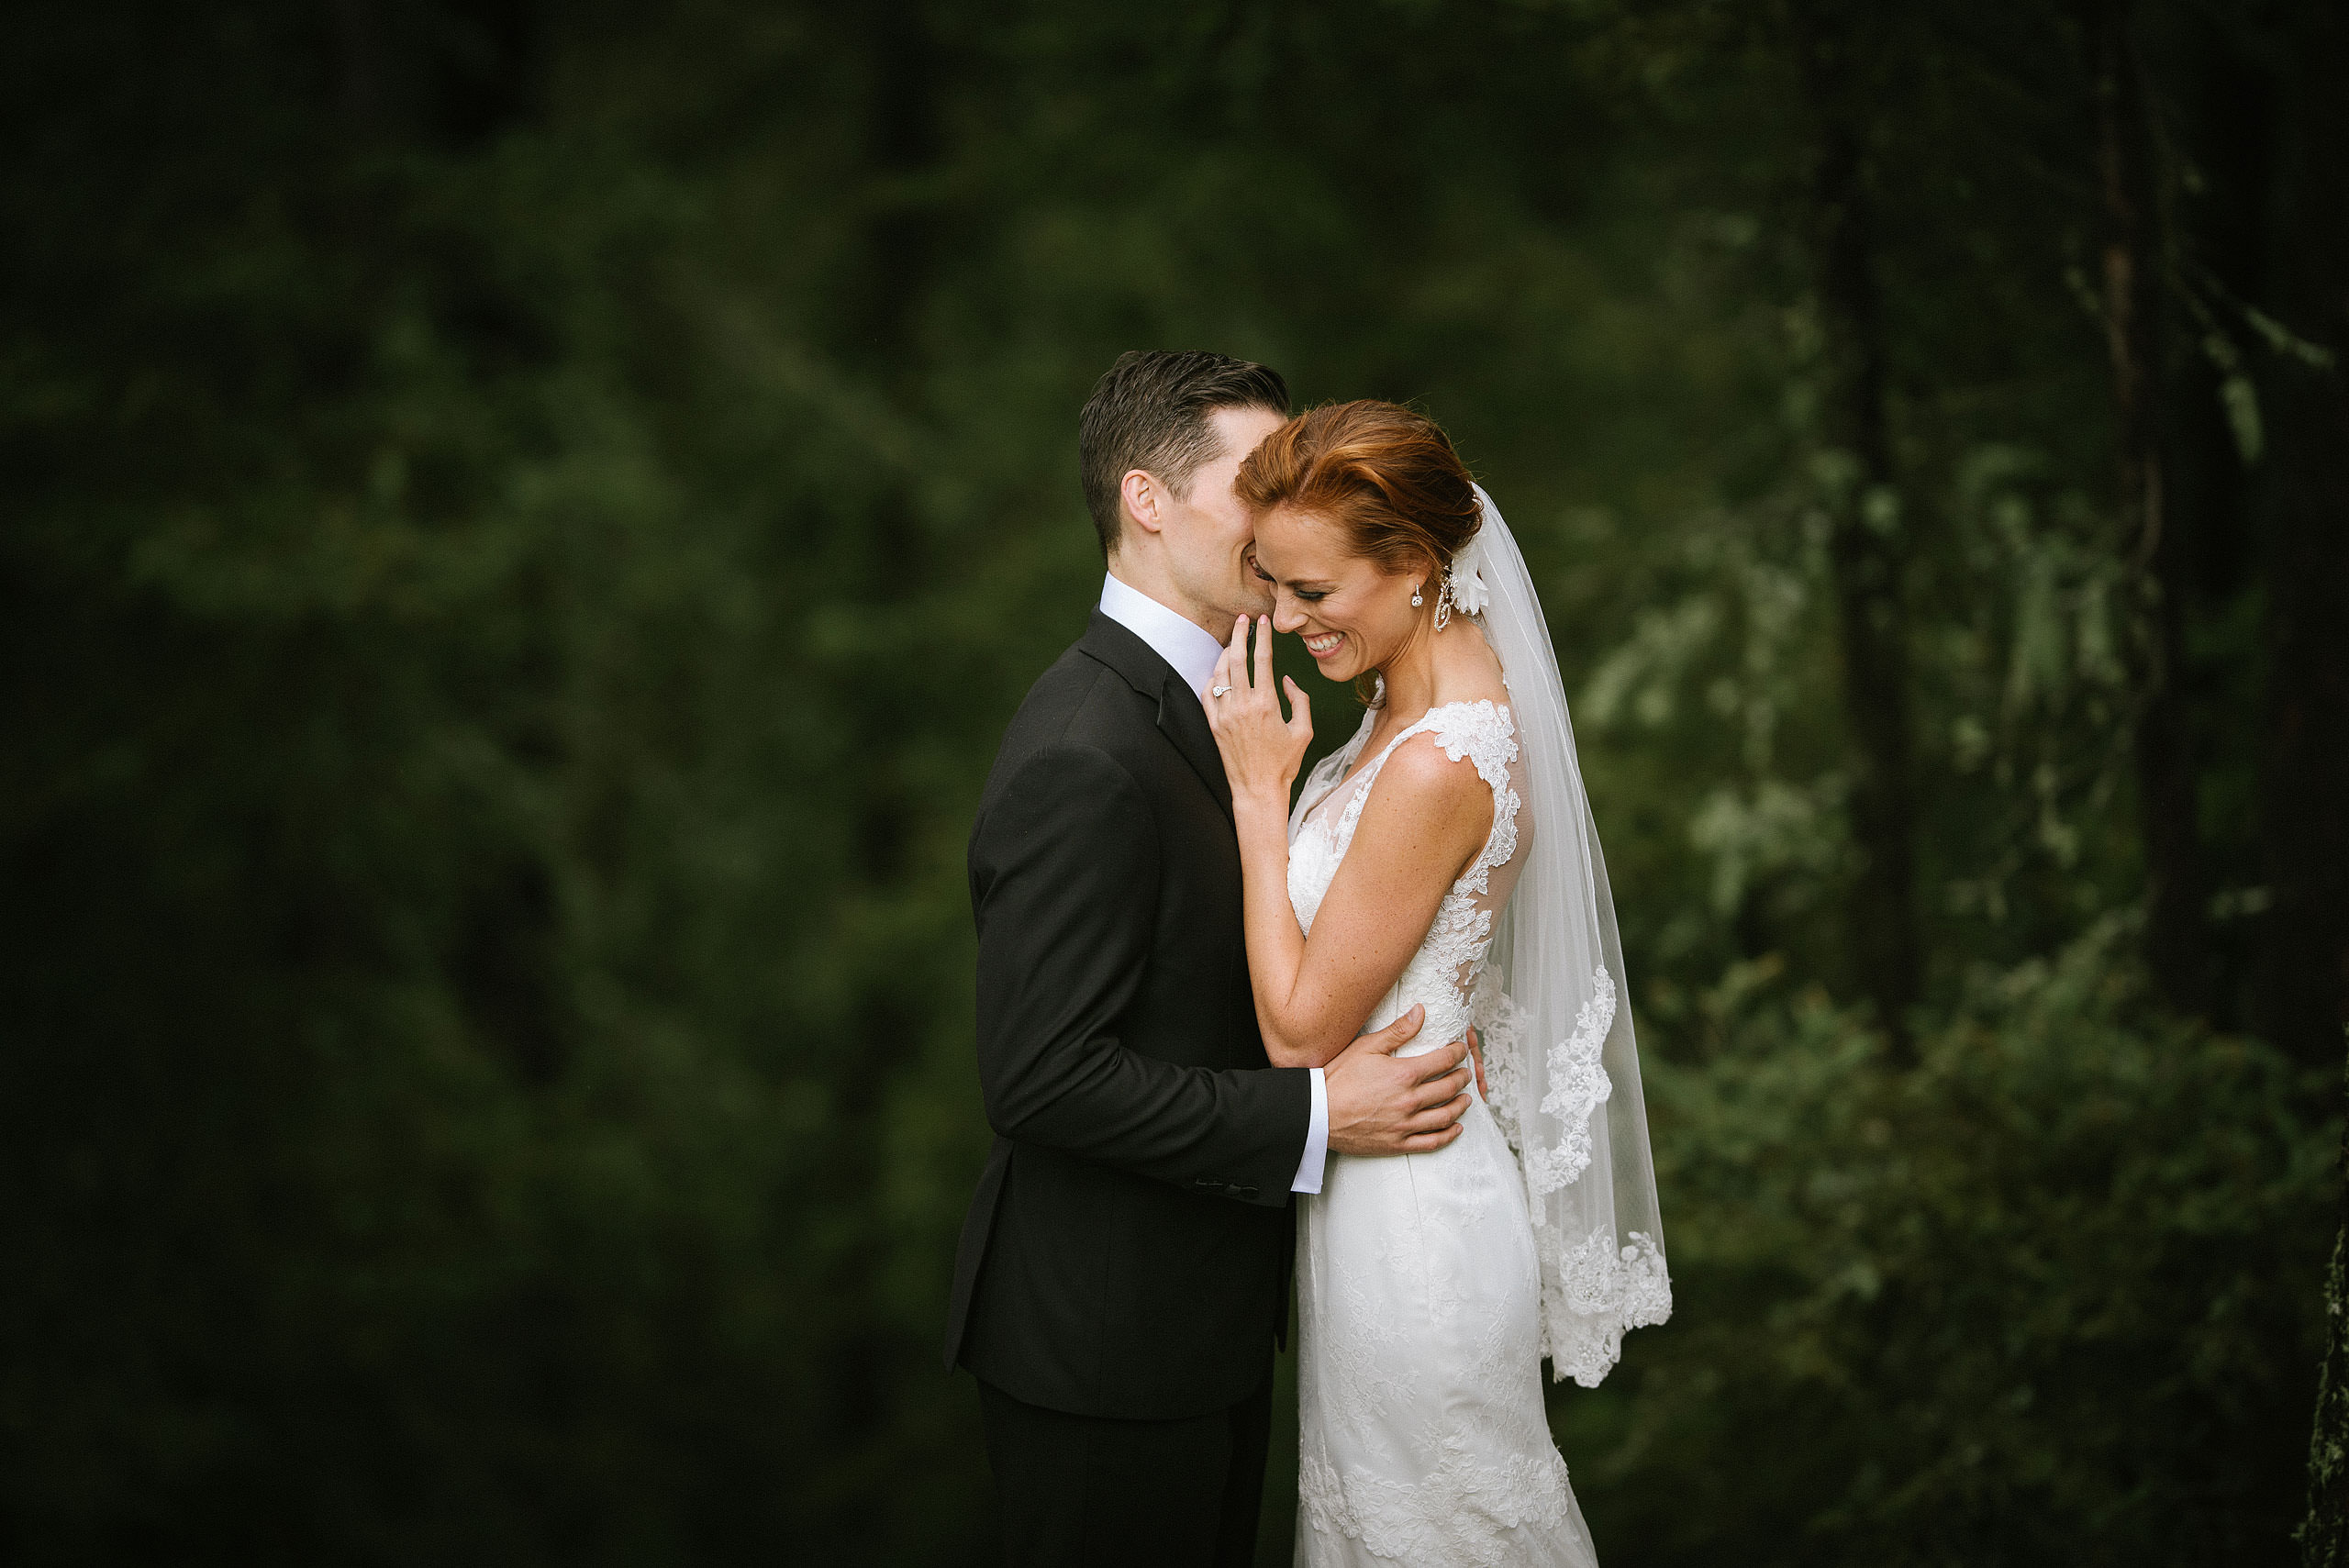 groom whispering into brides ear by top calgary wedding photographer sean leblanc